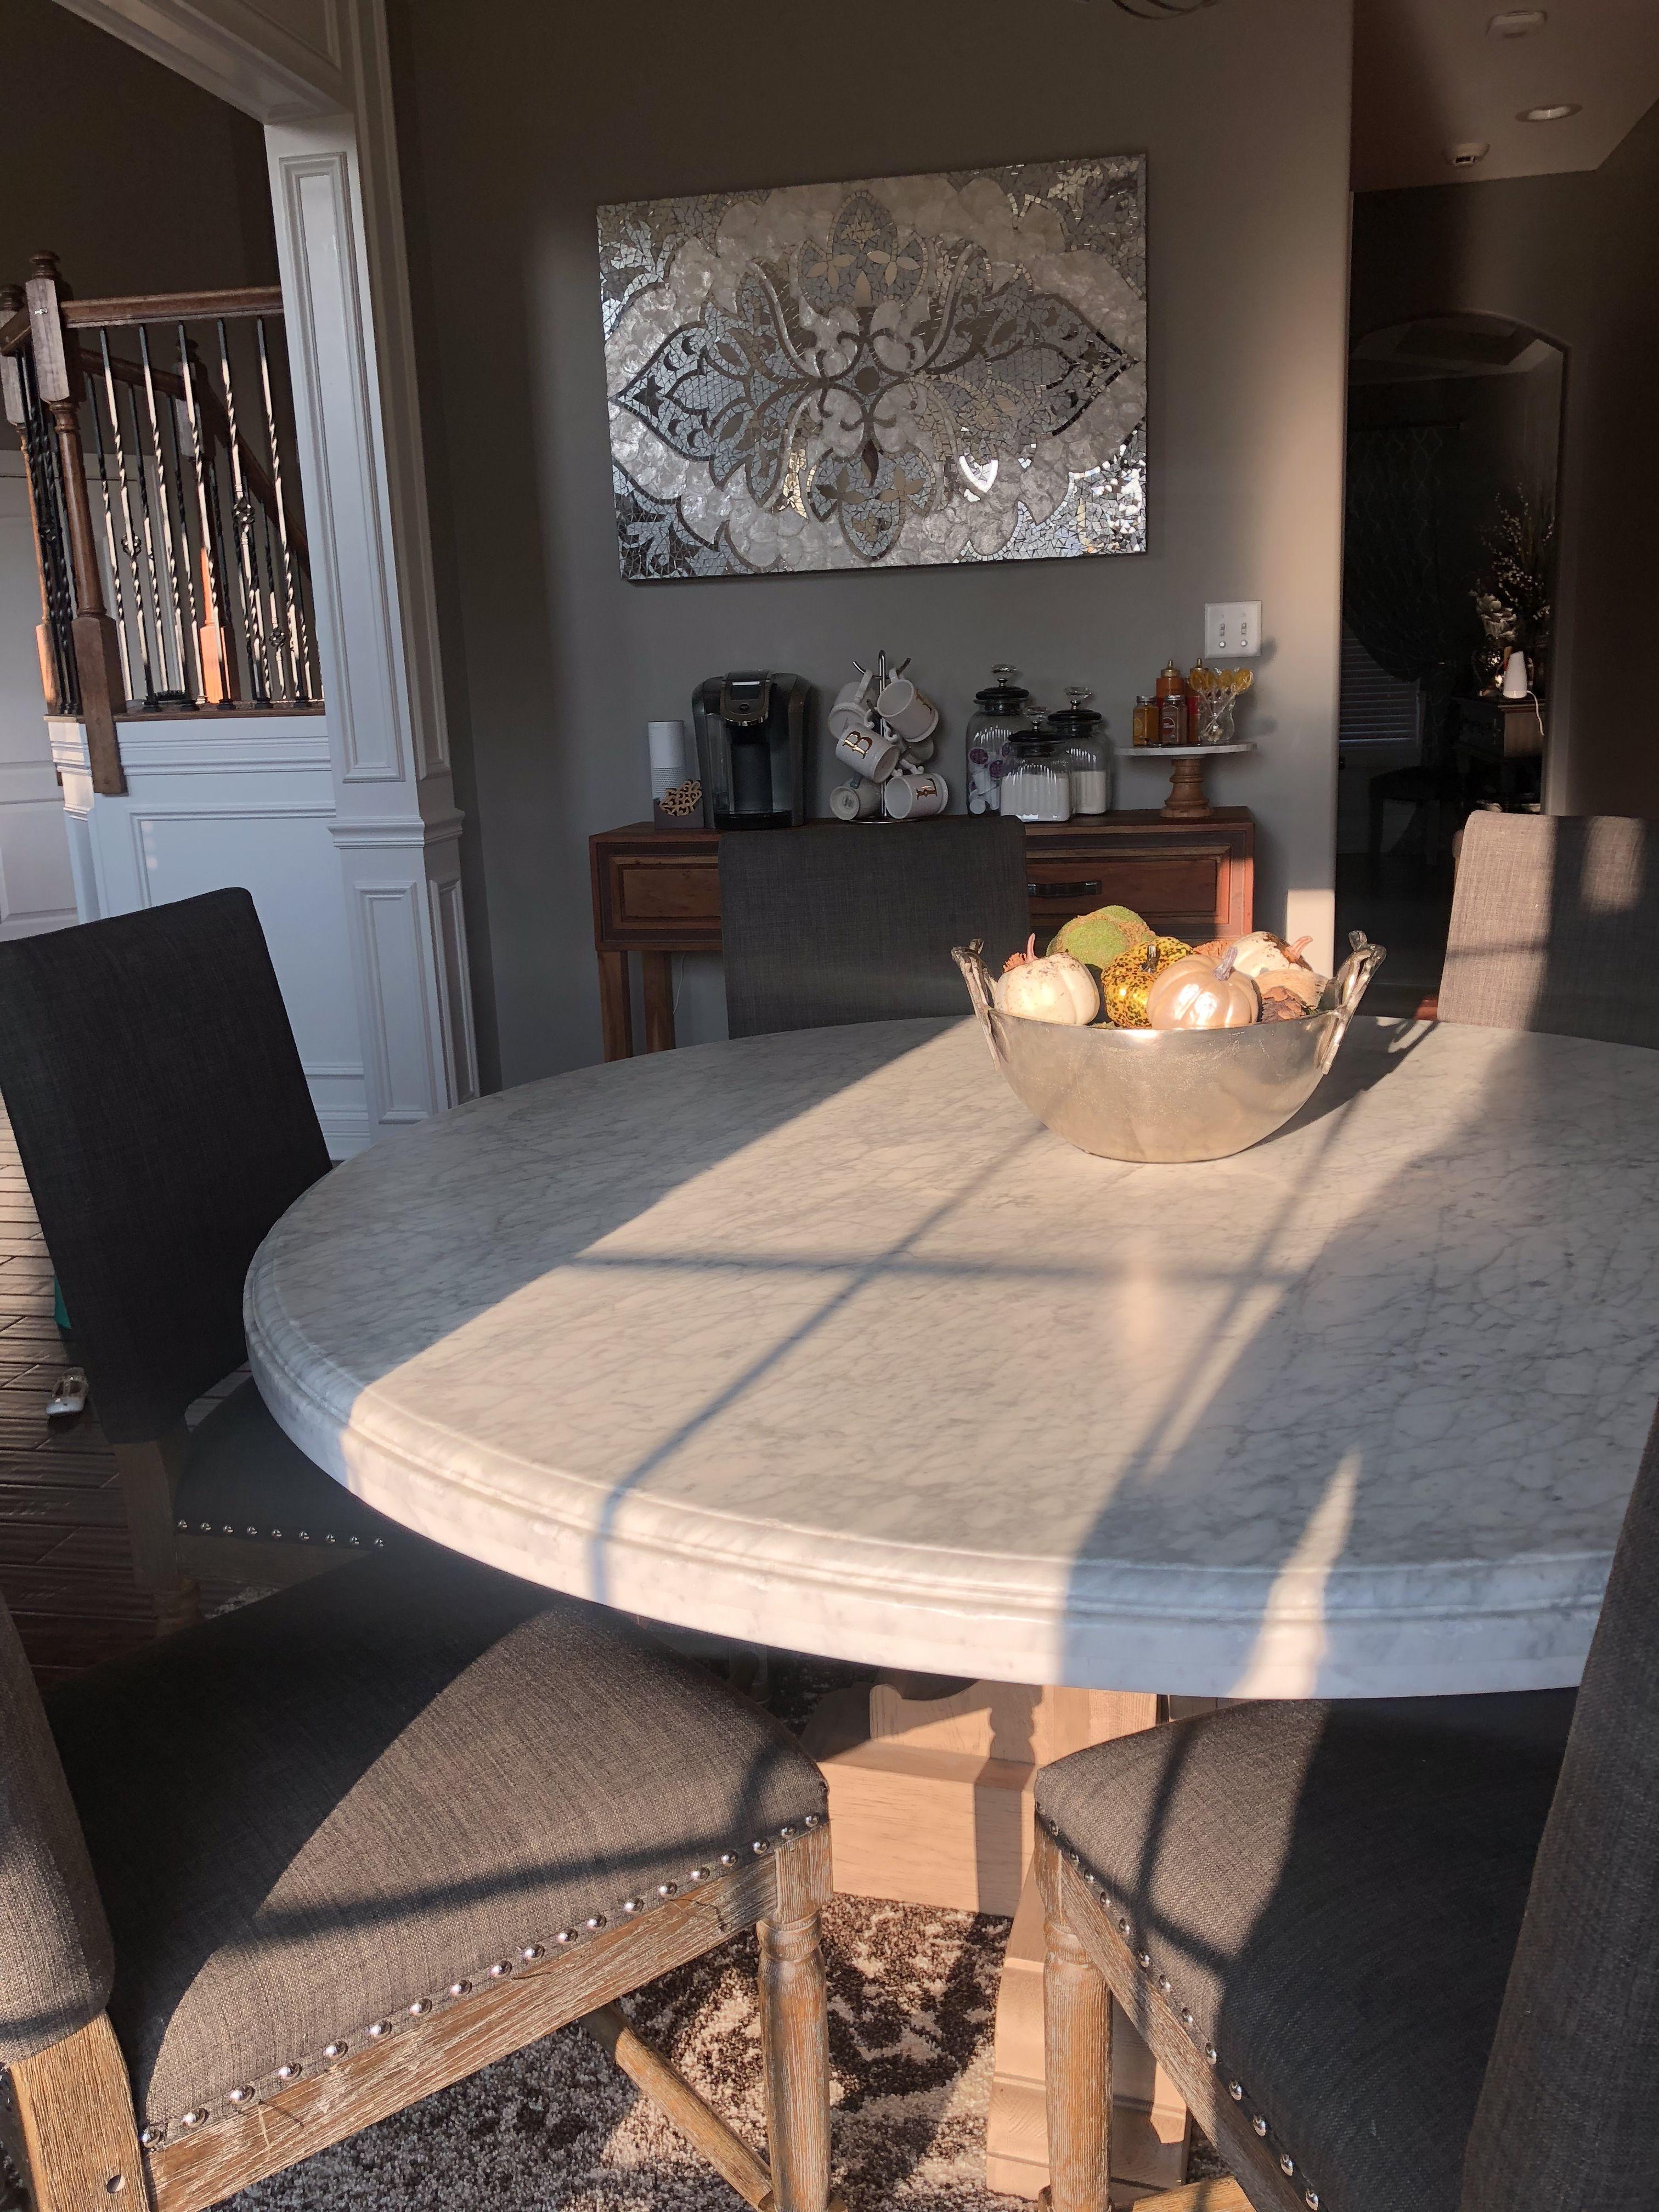 Restoration Hardware Marble Table Rustic Glam Rustic Decor